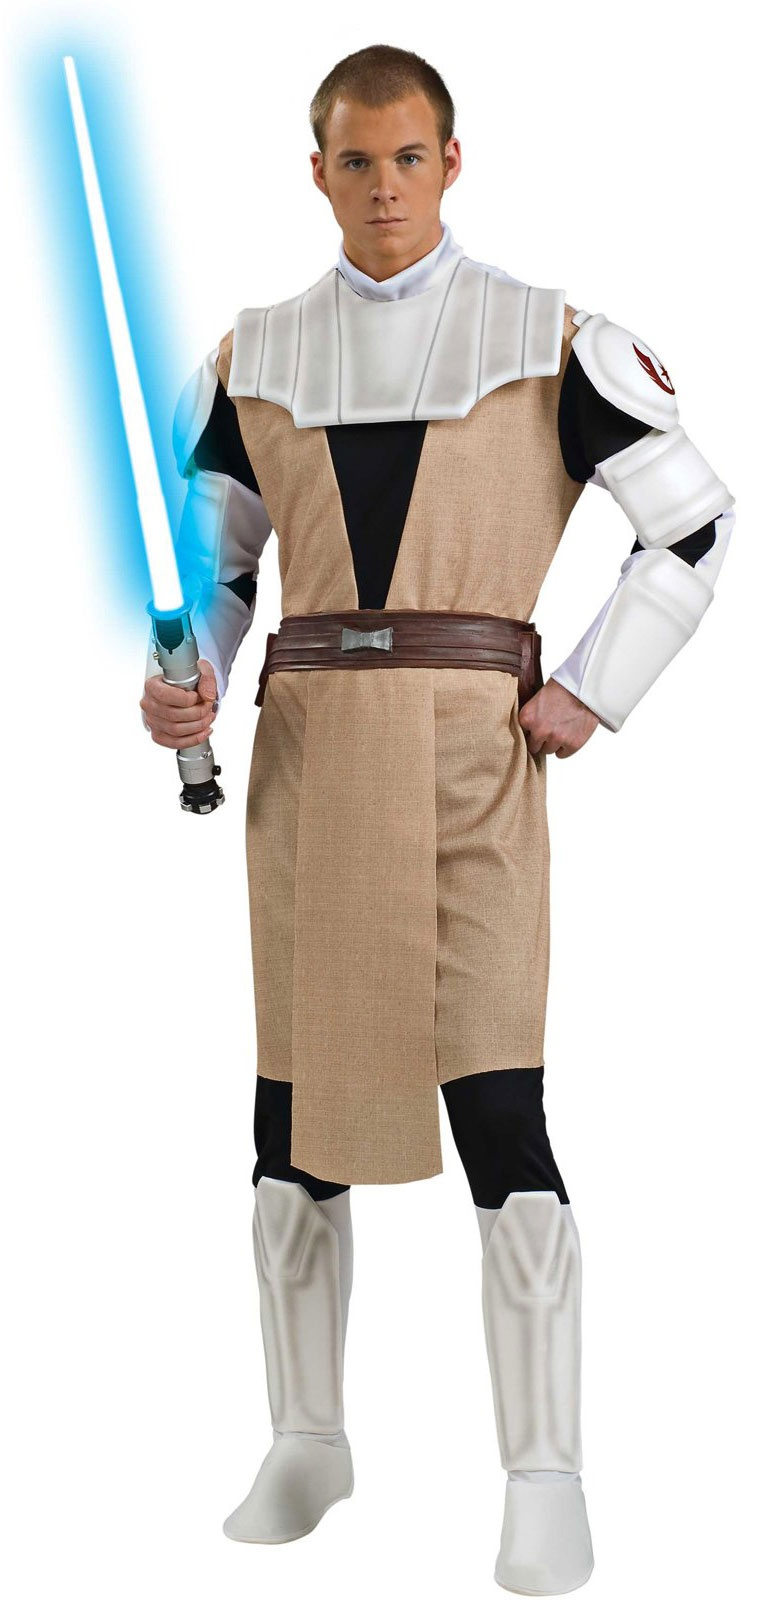 Deluxe Adult Obi Wan Kenobi Star Wars Costume Costumes